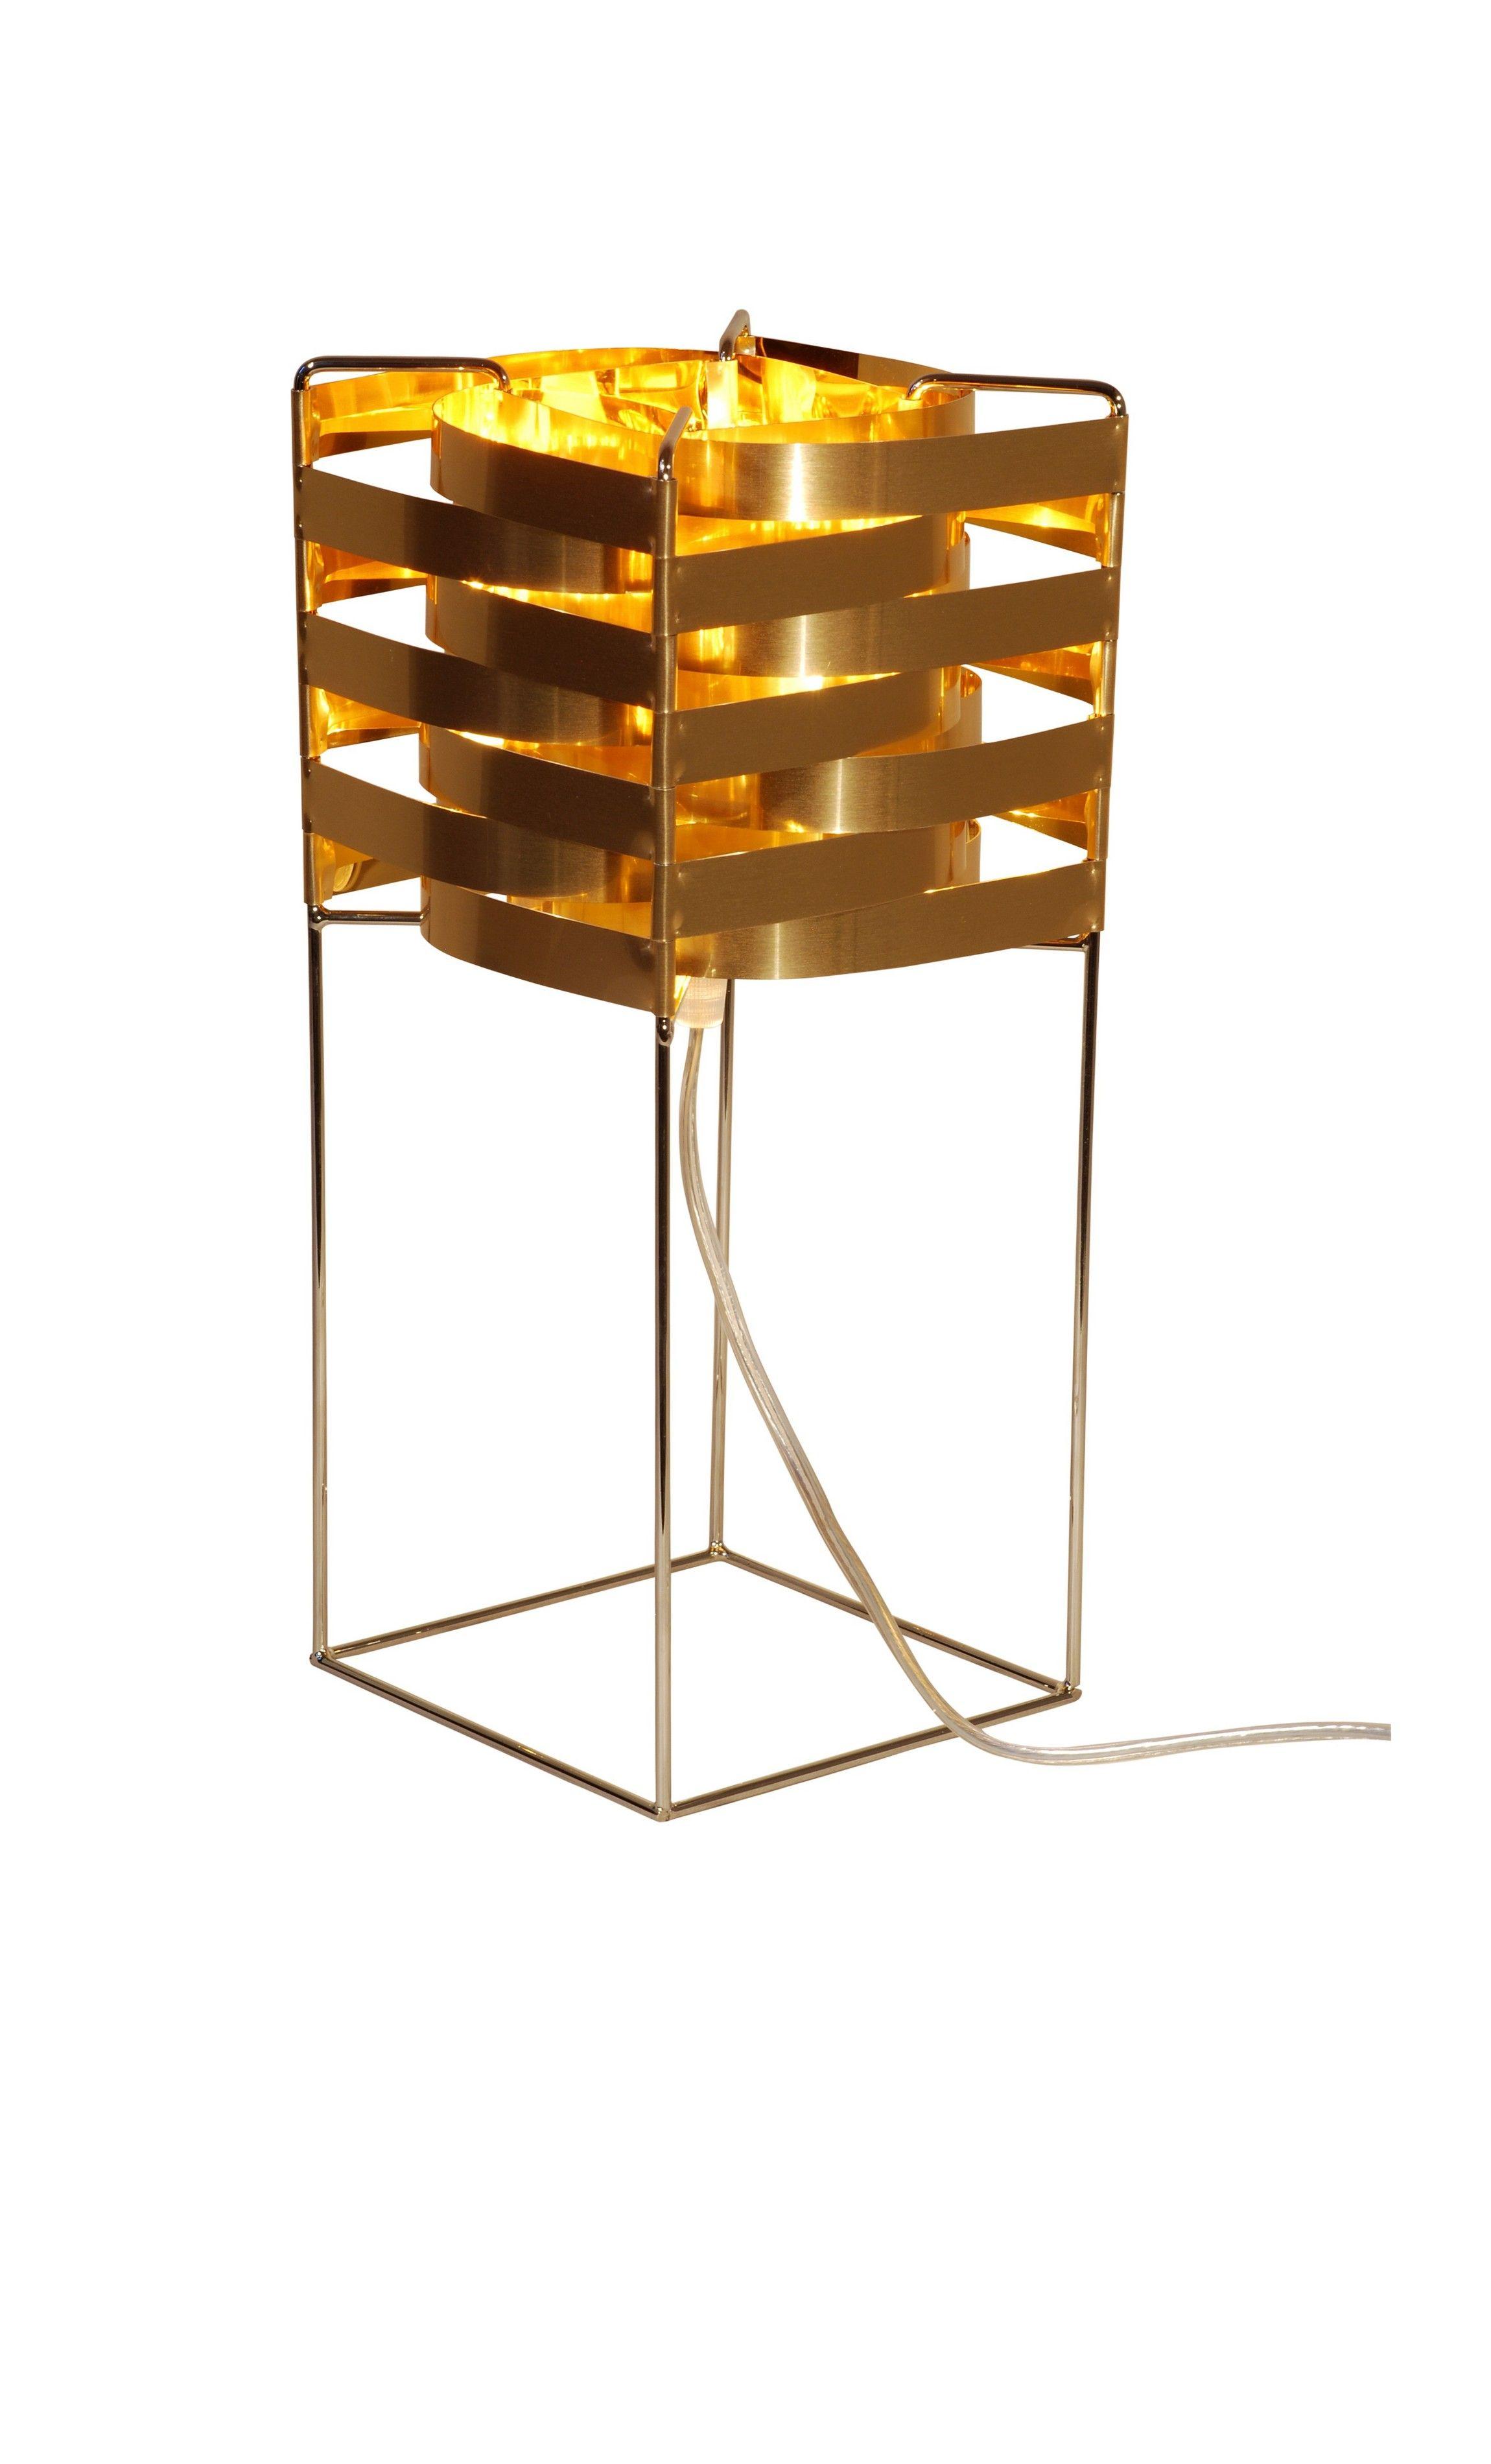 Lampe Max Sauze Lampes De Table Lamp Lampe Design